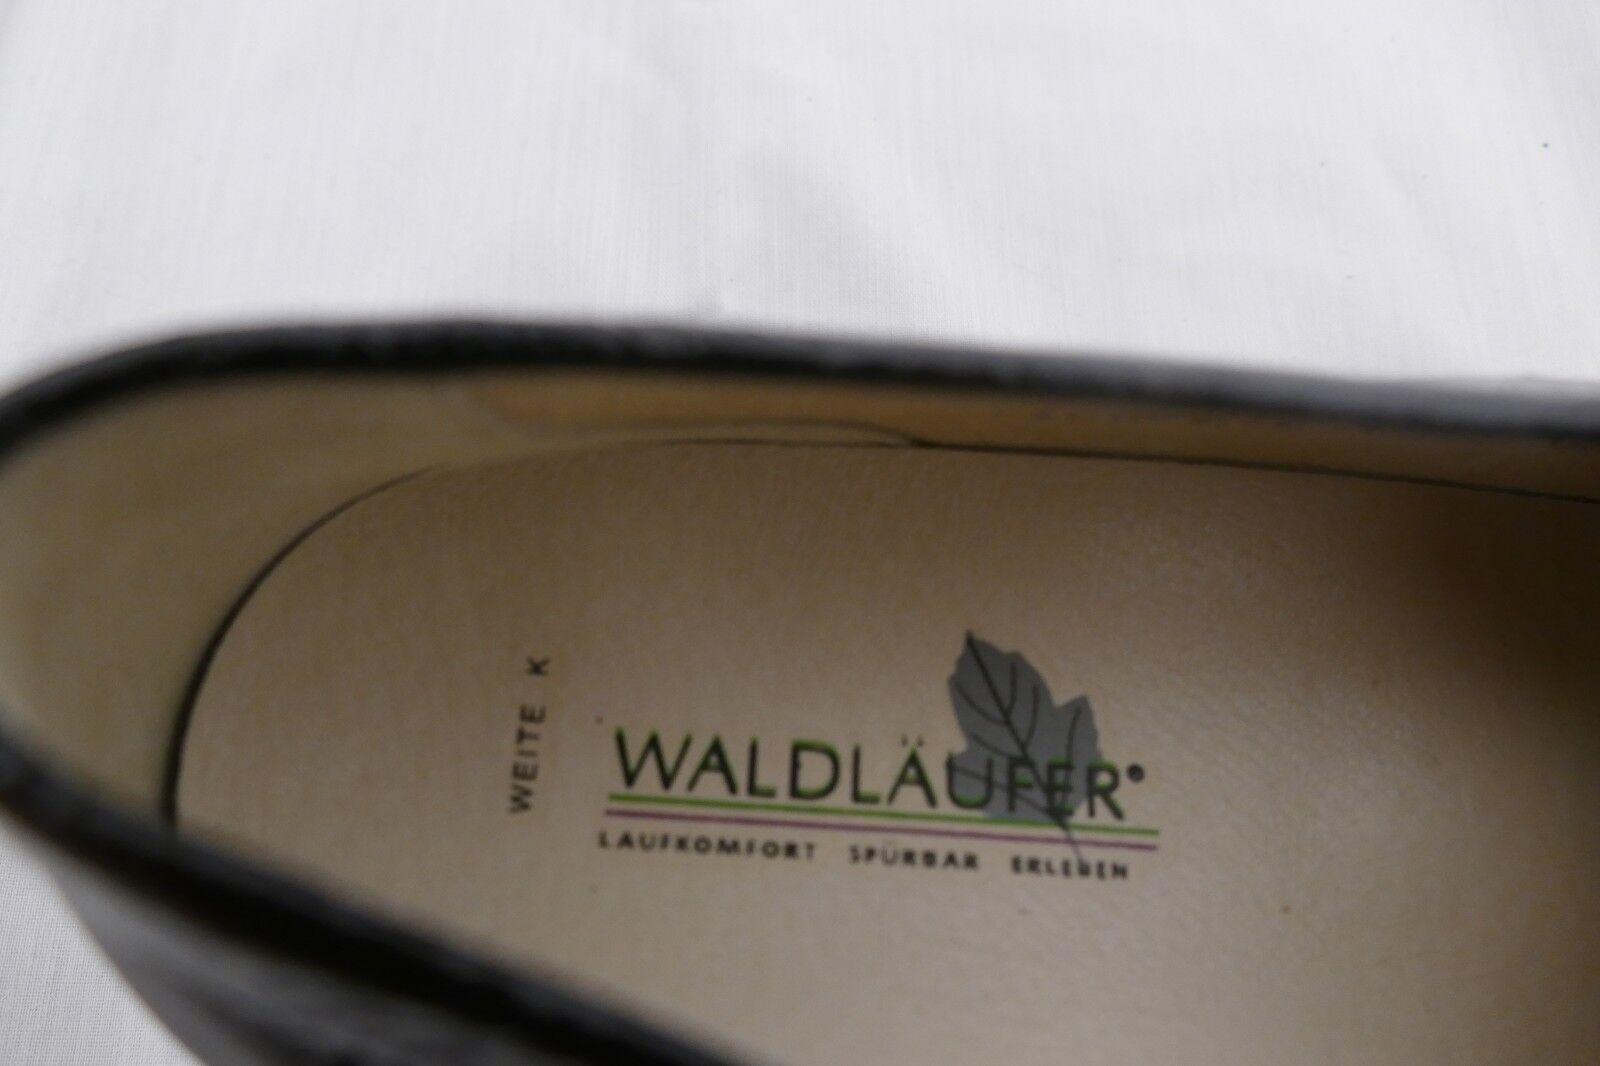 1237---Waldläufer schwarz UK Leder 4,5 Gr.37,5 Lackleder/ Glattleder Leder UK innen,neu 73ee76